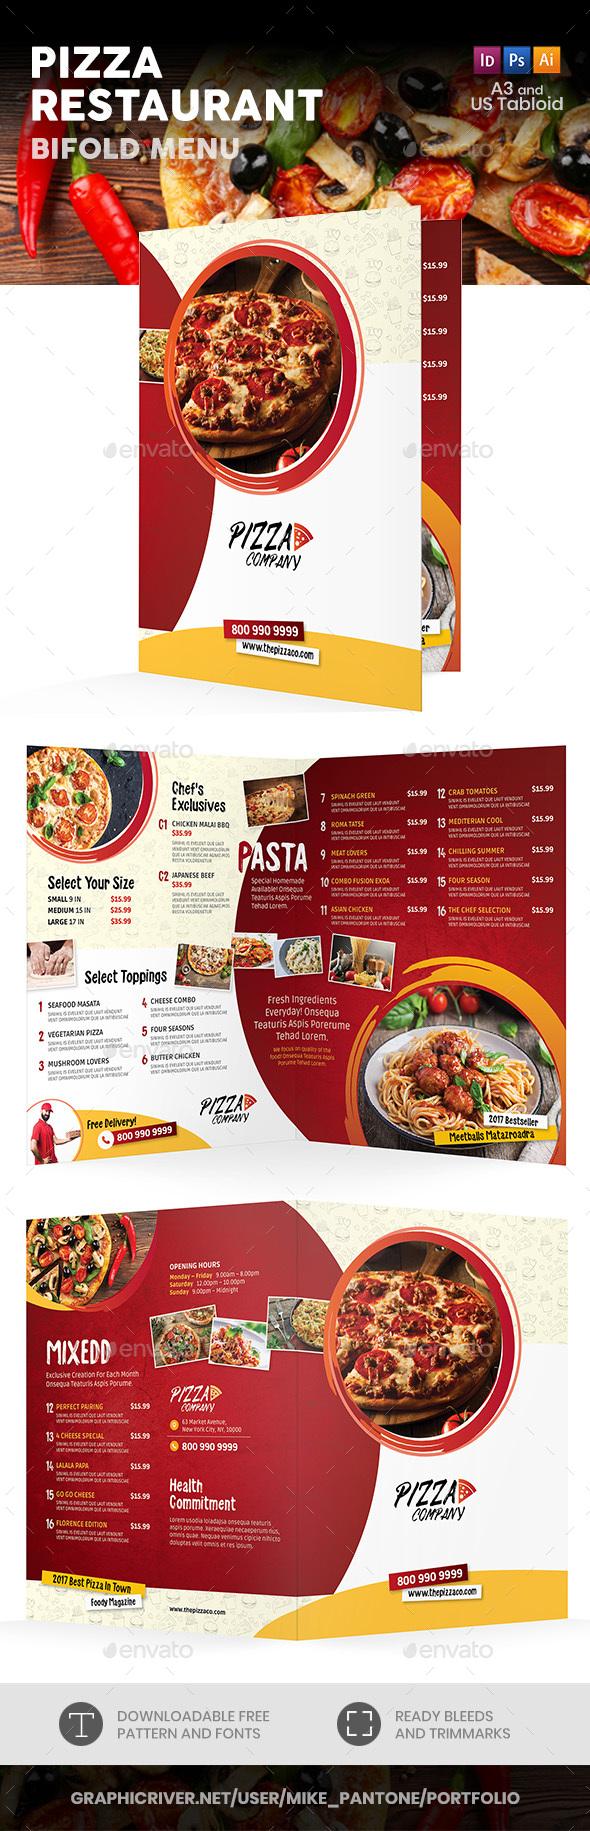 Pizza Restaurant Bifold / Halffold Menu 2 - Food Menus Print Templates